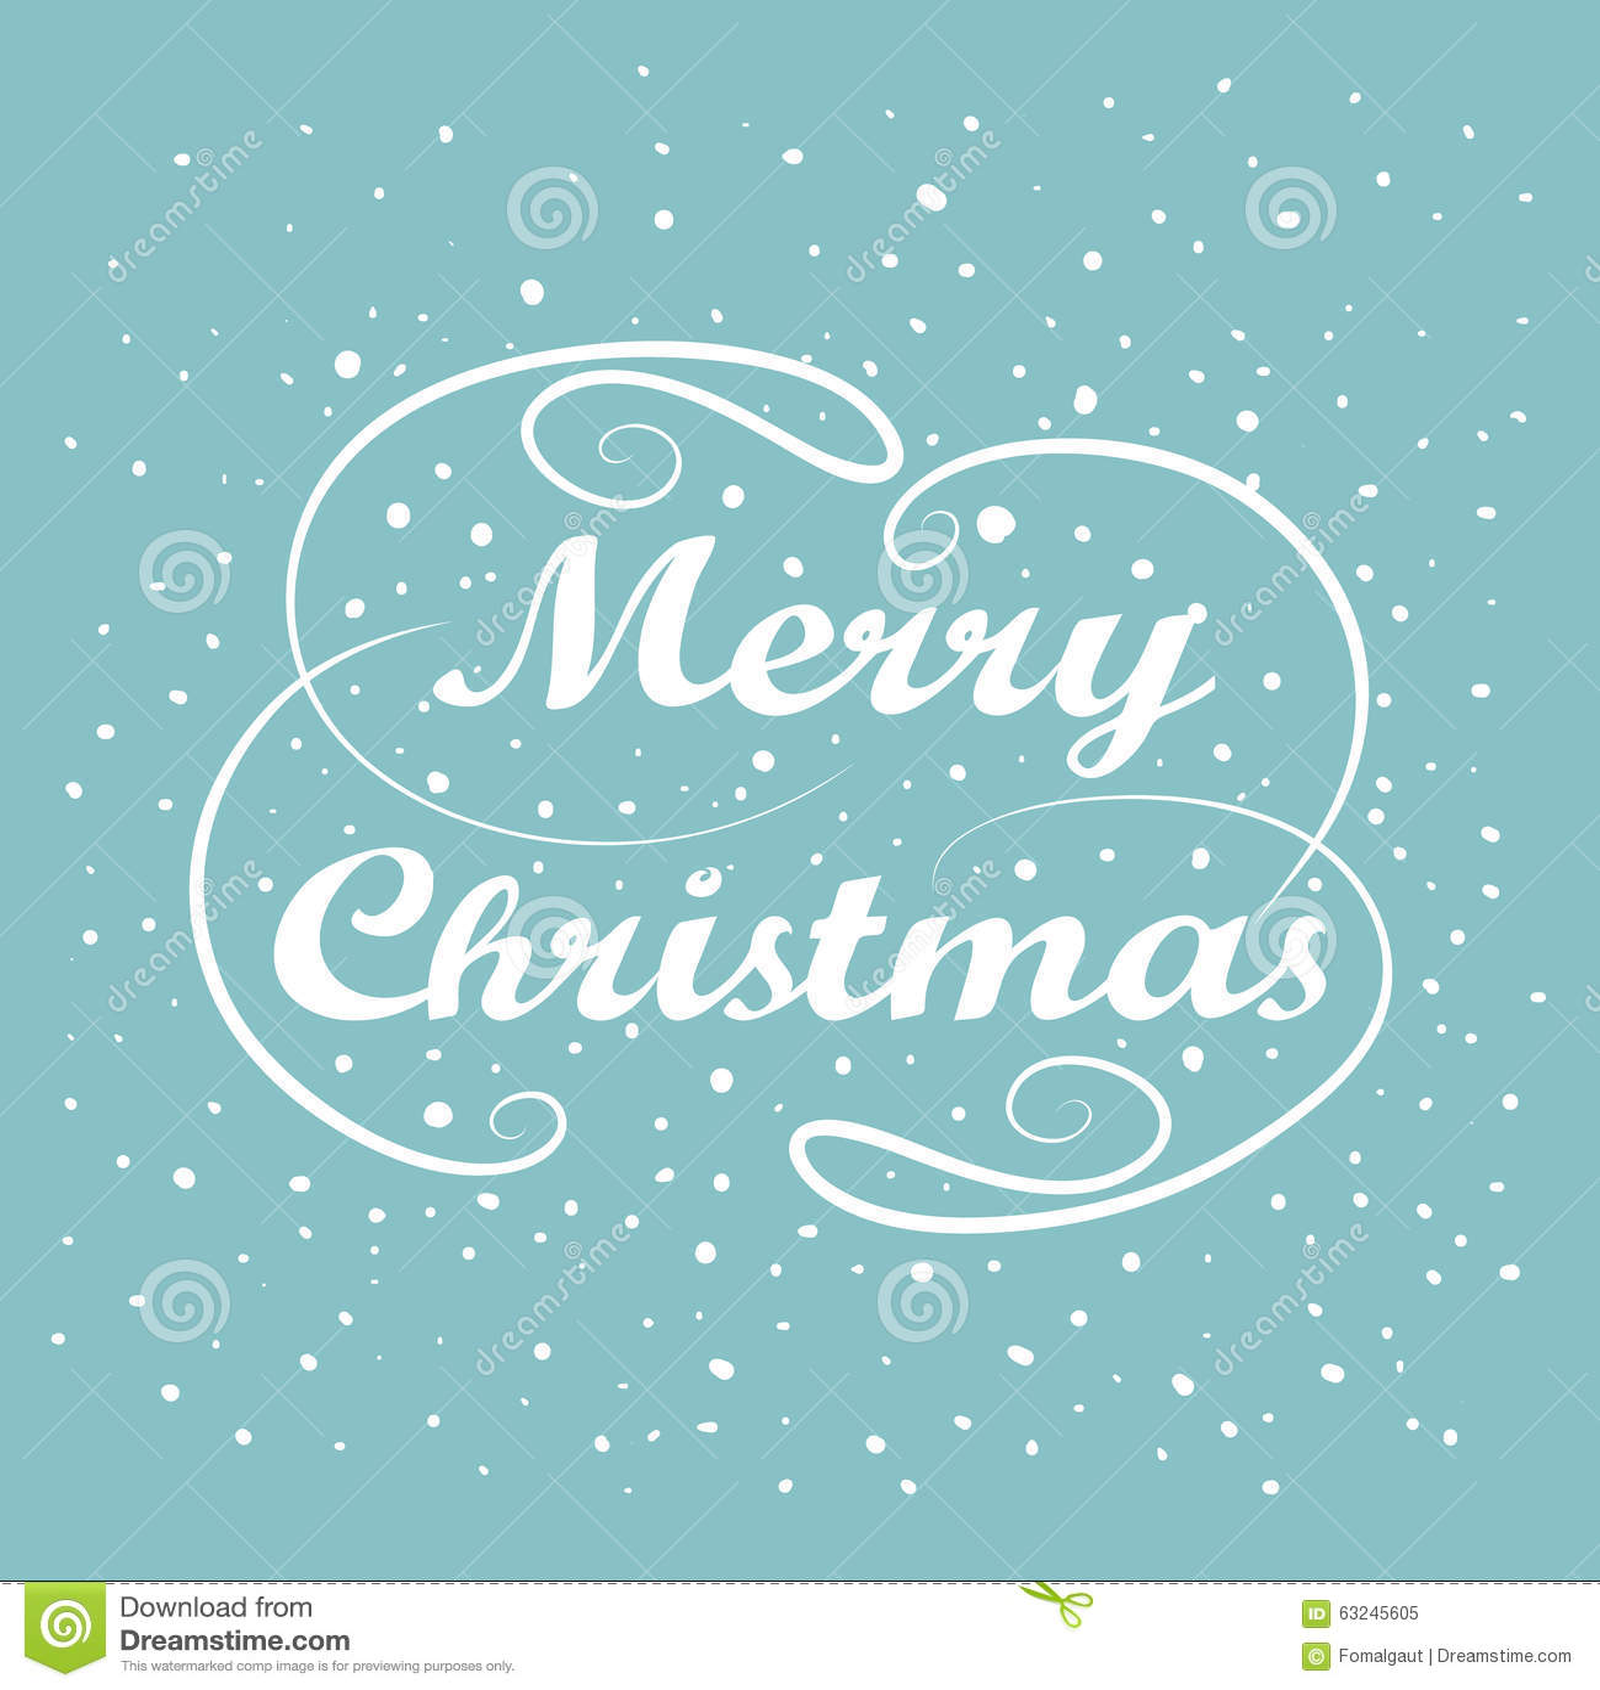 Merry christmas hand lettering handmade calligraphy holiday download merry christmas hand lettering handmade calligraphy holiday greeting card design vintage handwriting message m4hsunfo